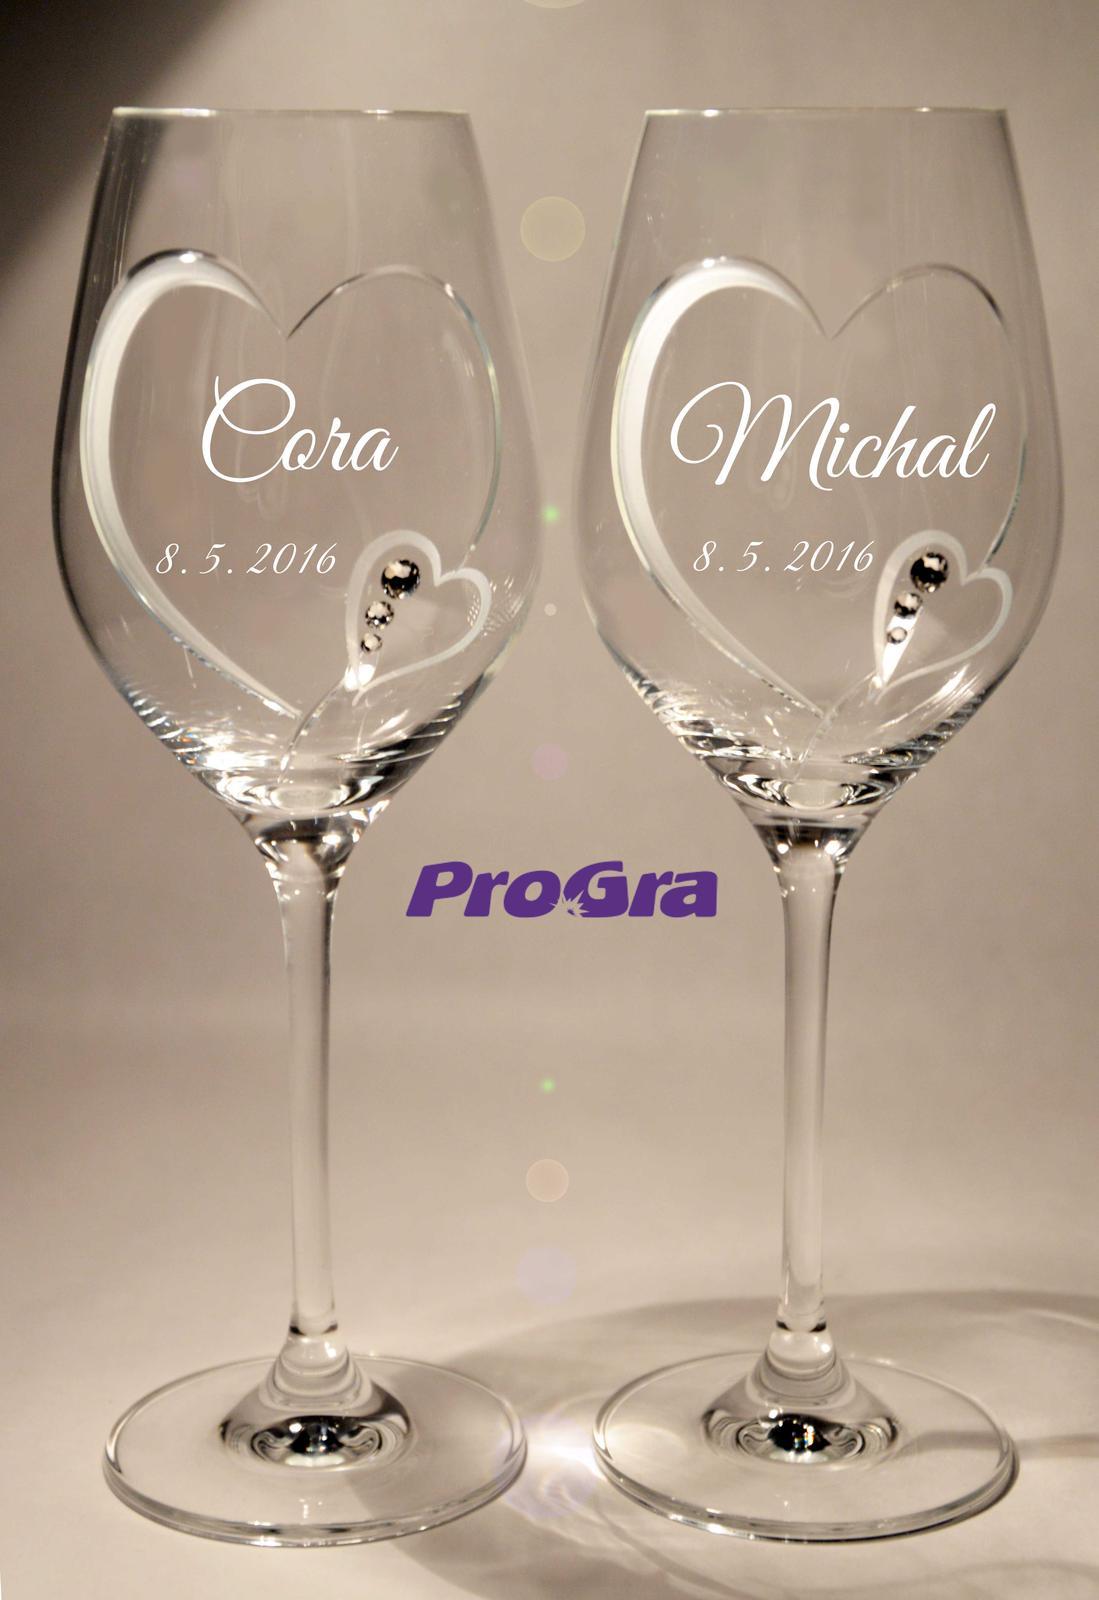 Svatební skleničky - Cora - svatební skleničky